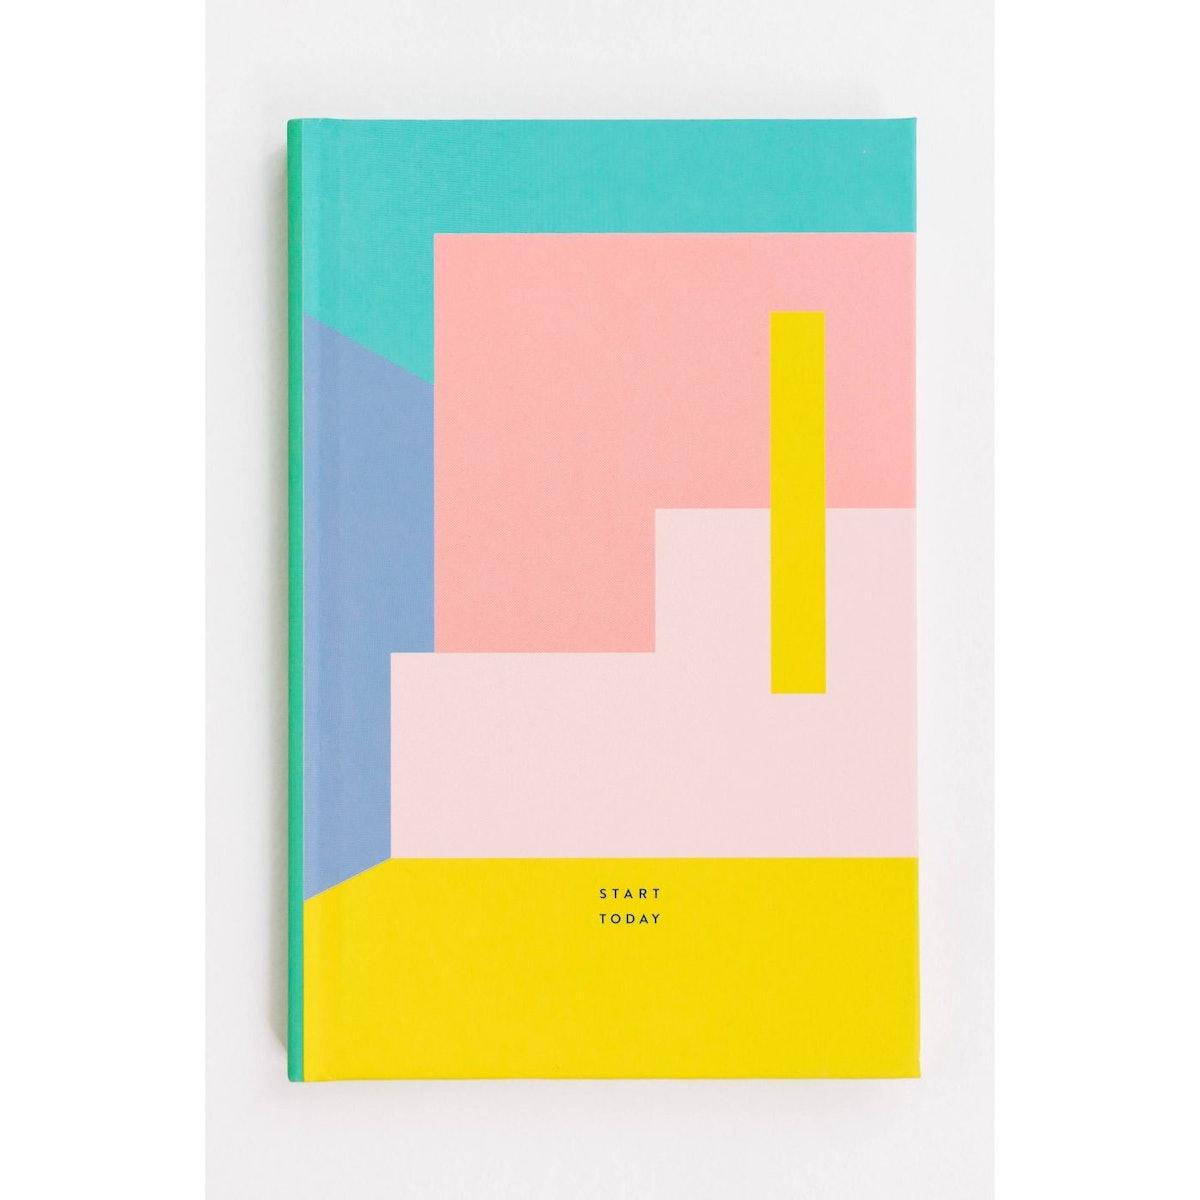 'Go All In Journal - Start Today' by Rachel Hollis